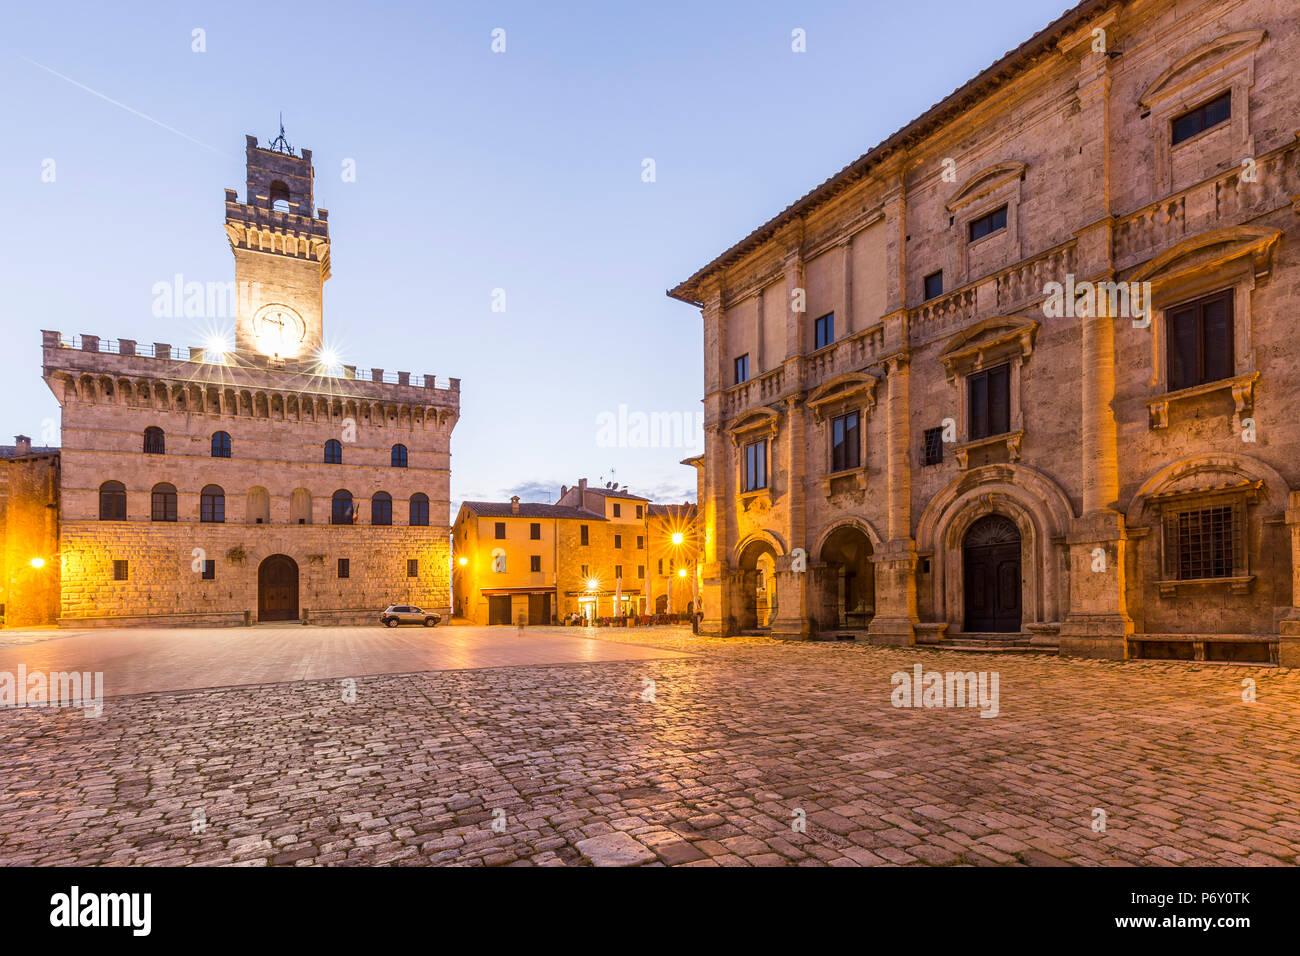 Italy. Tuscany. Siena district Val di Chiana. Montepulciano. Piazza Grande. Stock Photo